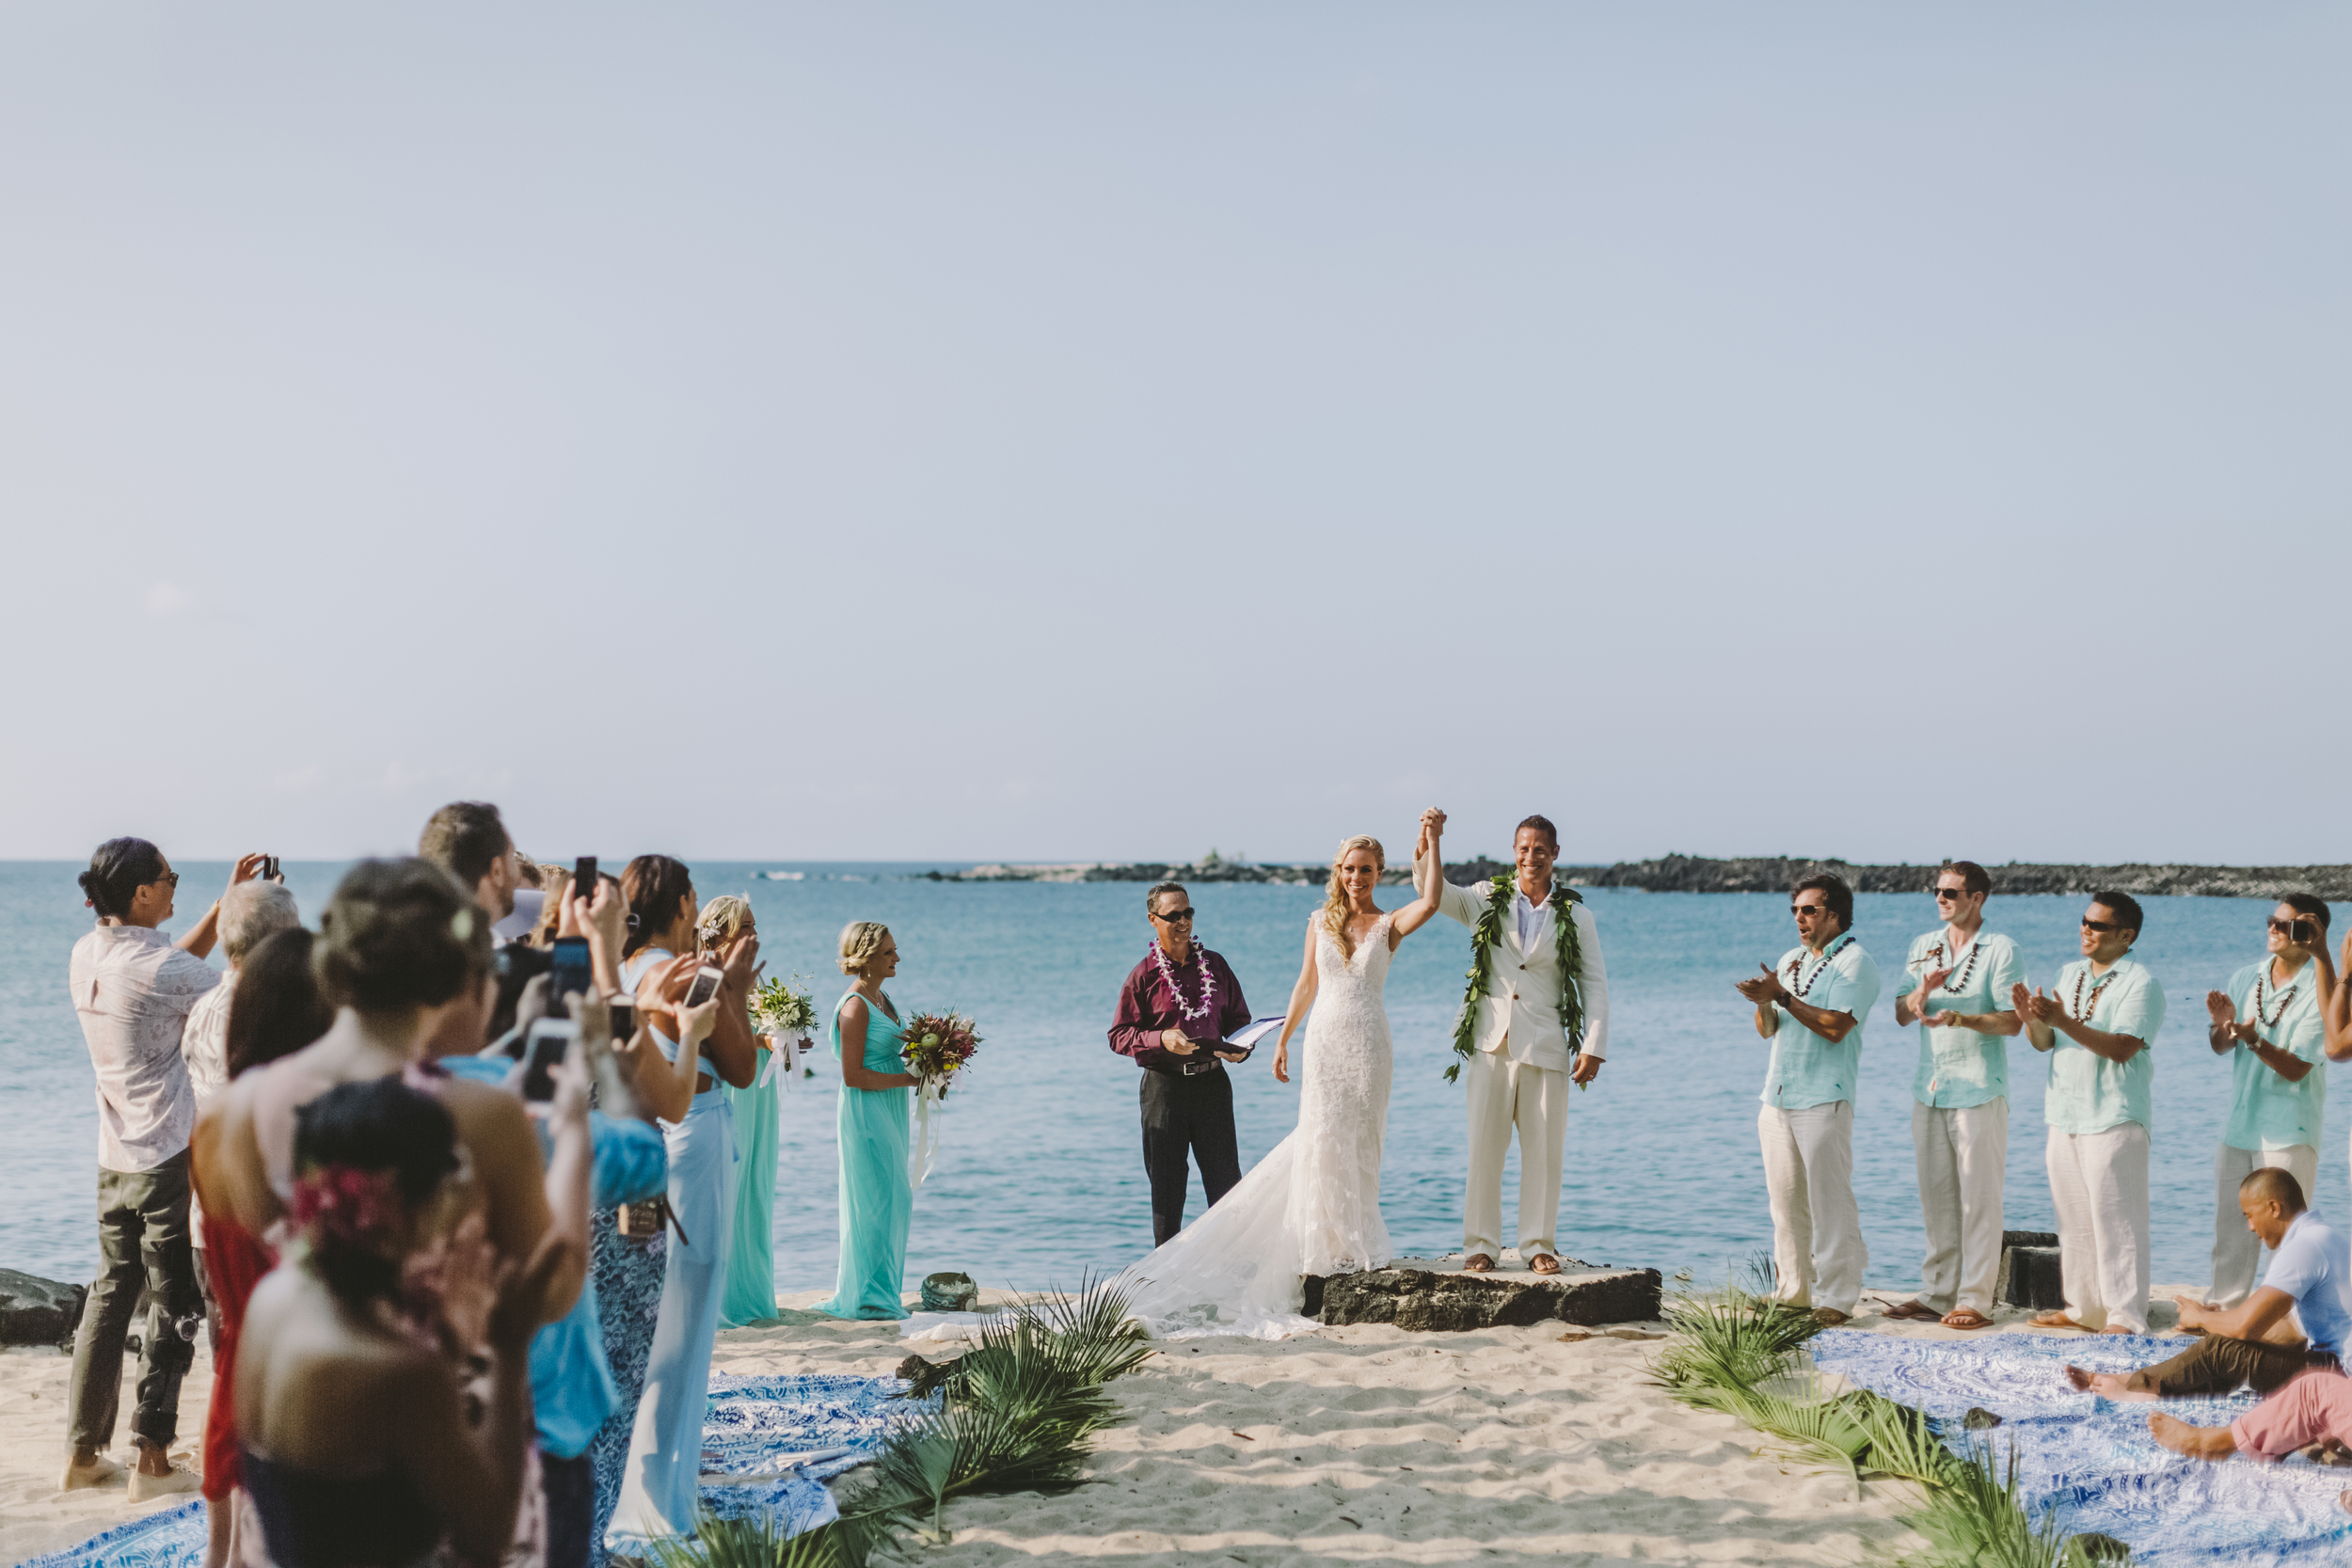 angie-diaz-photography-hawaii-wedding-photographer-kelli-jay-79.jpg